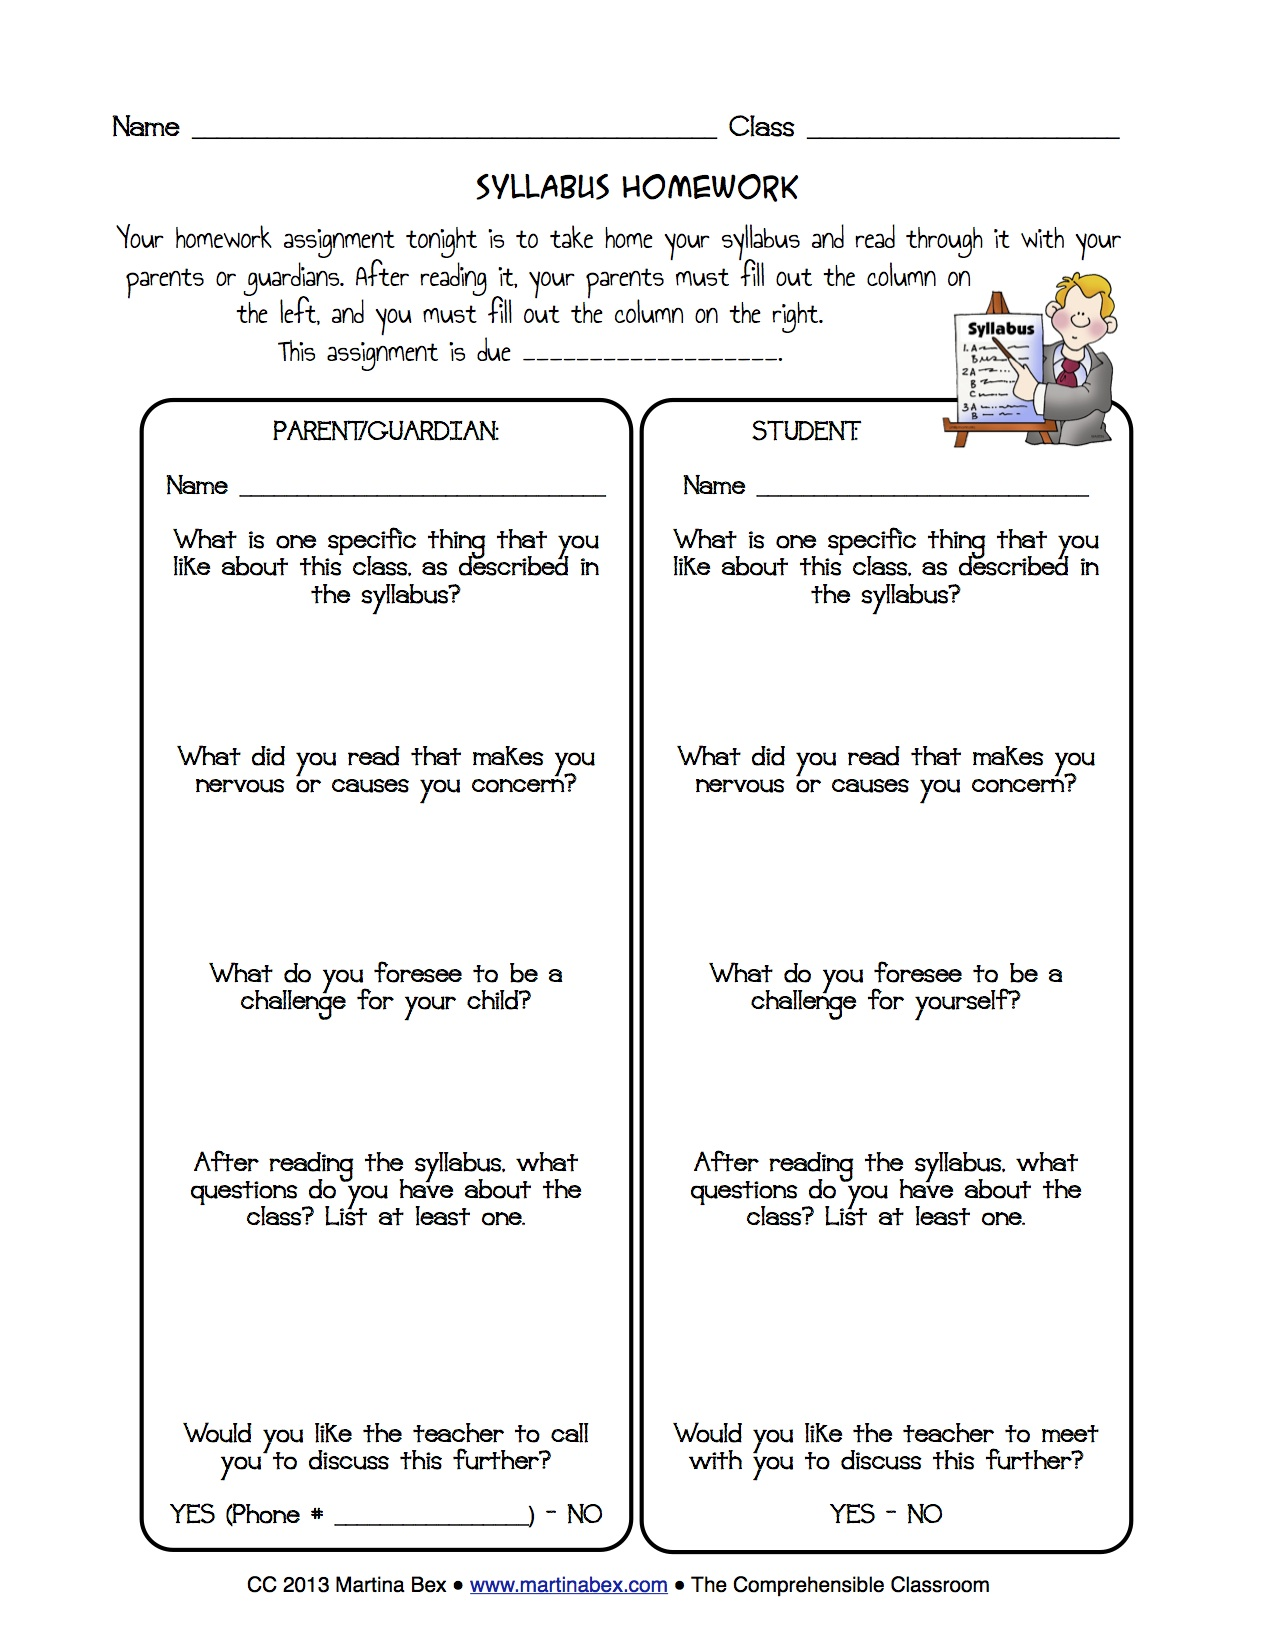 Syllabus Homework The Comprehensible Classroom